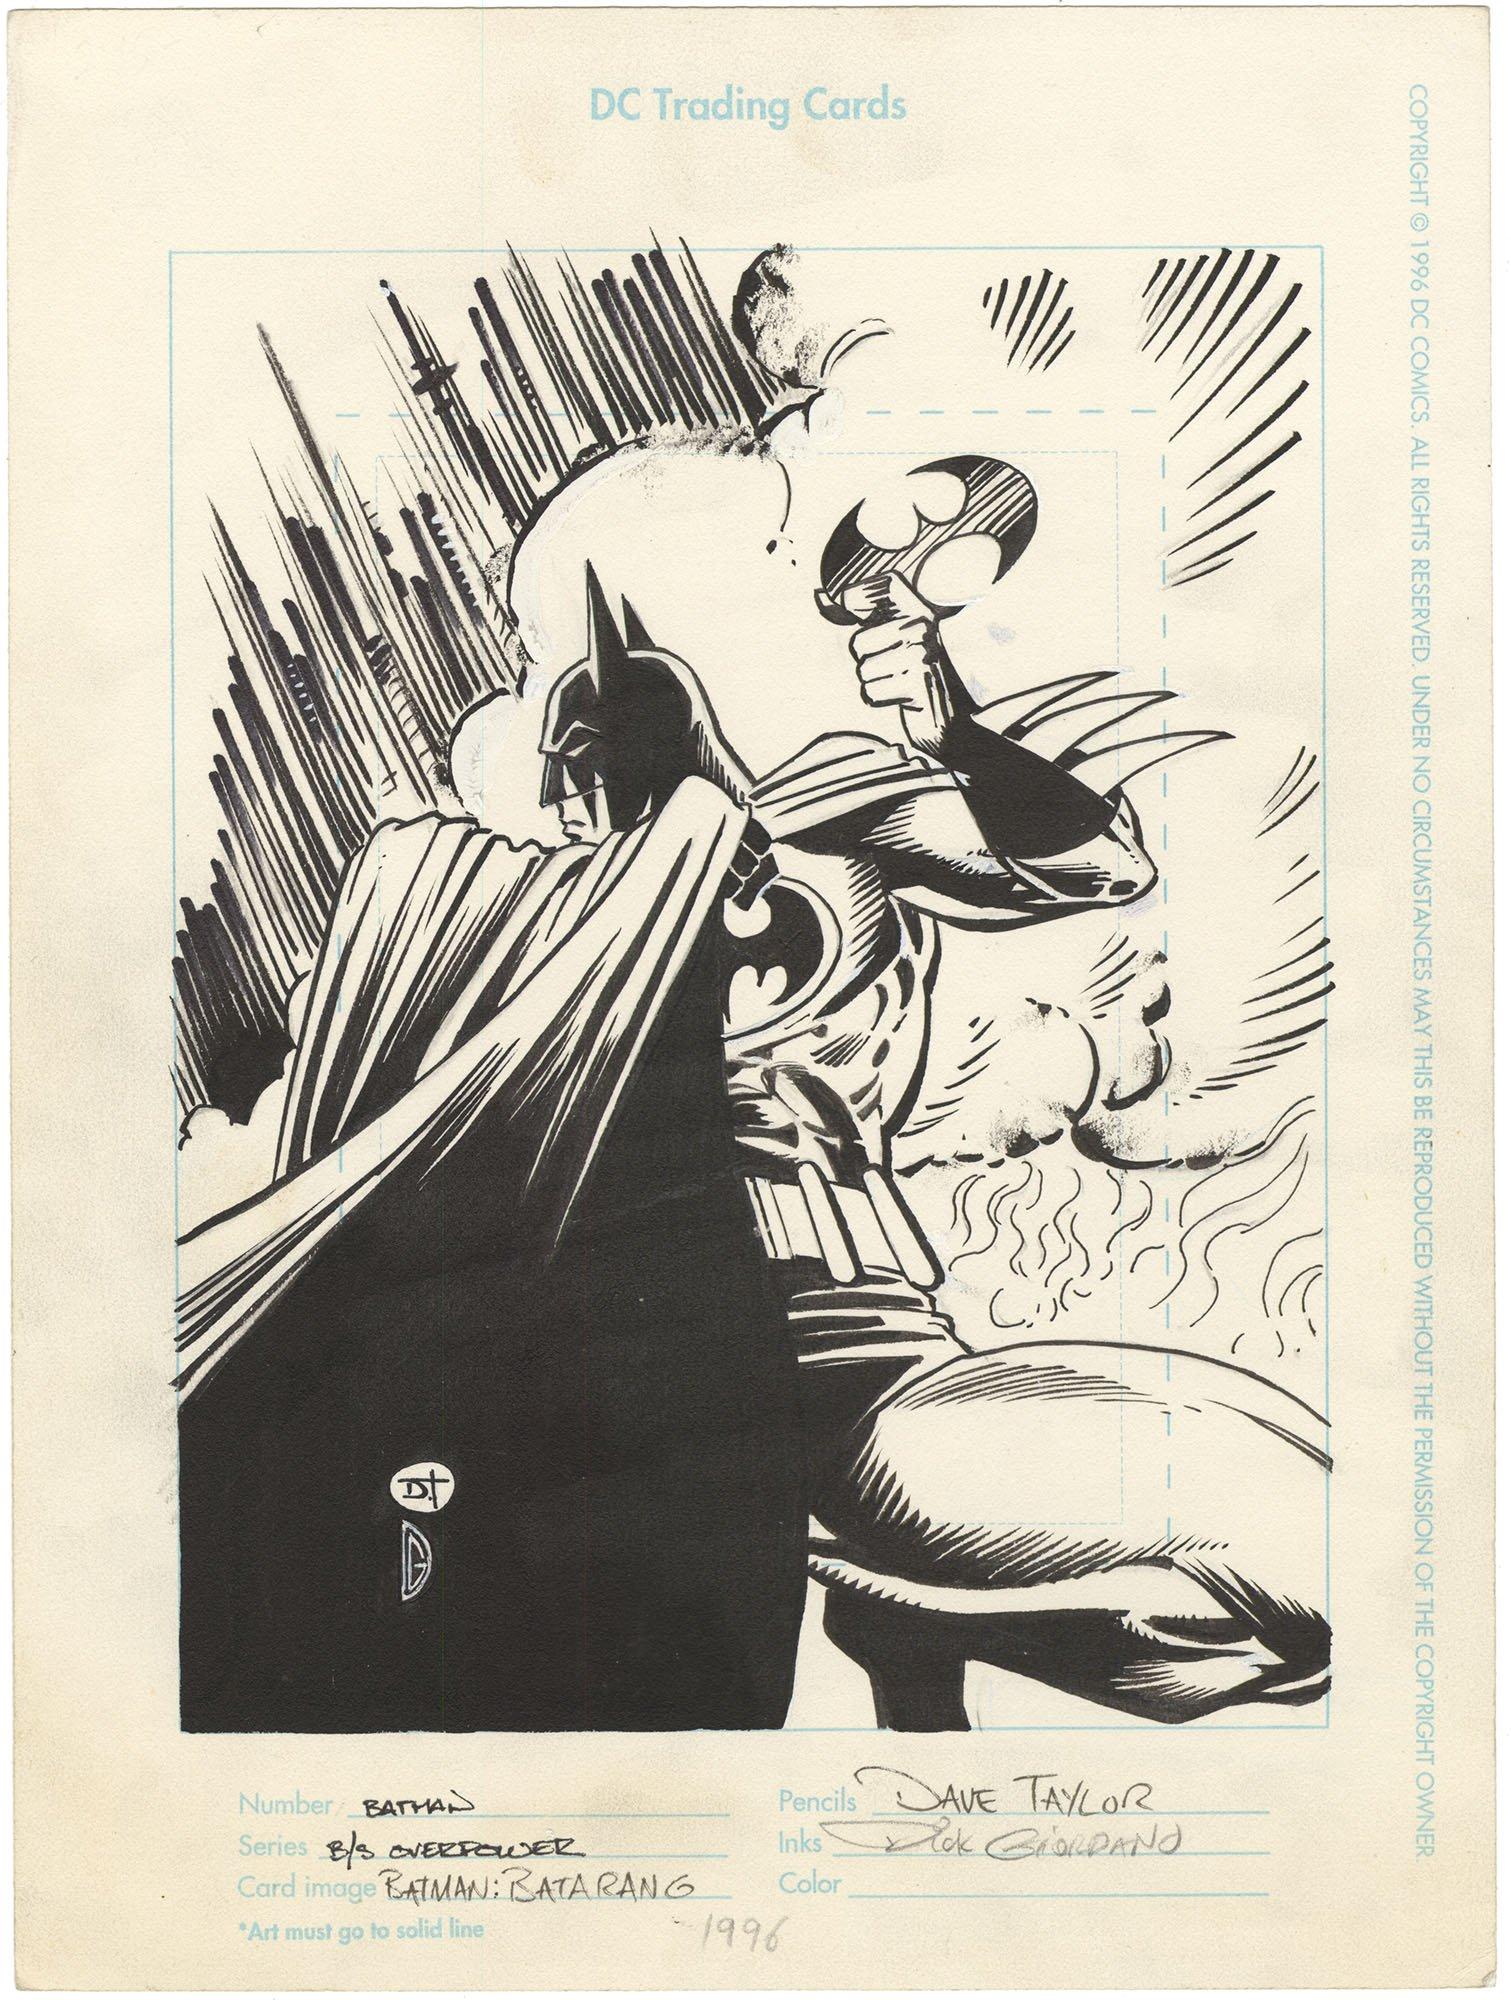 Overpower Batman Batarang Trading Card